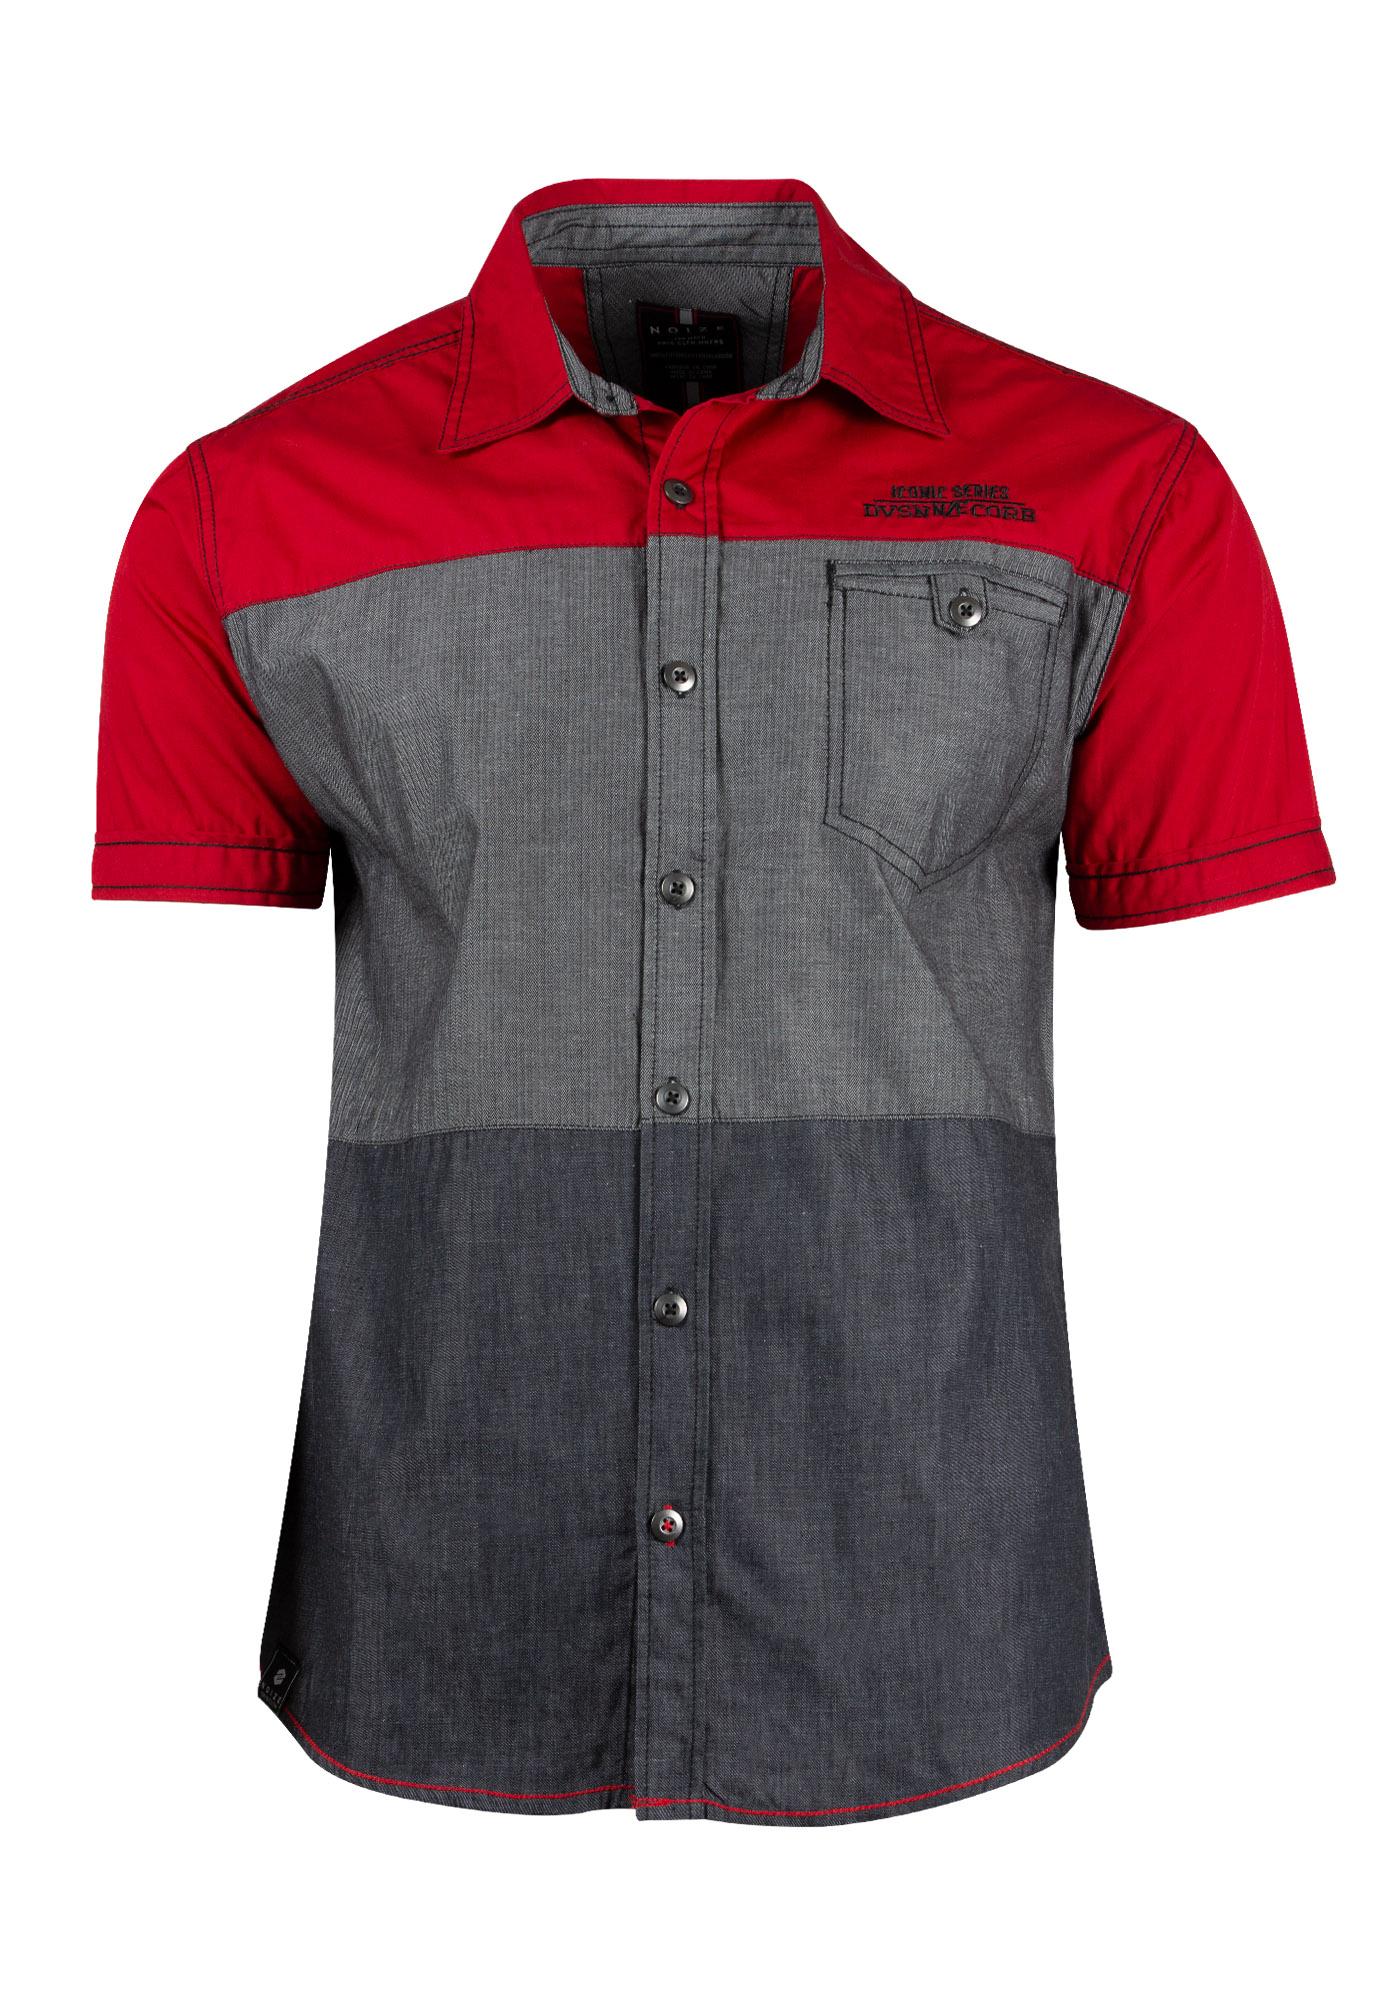 71abce7cc49 Men s Colour Block Shirt